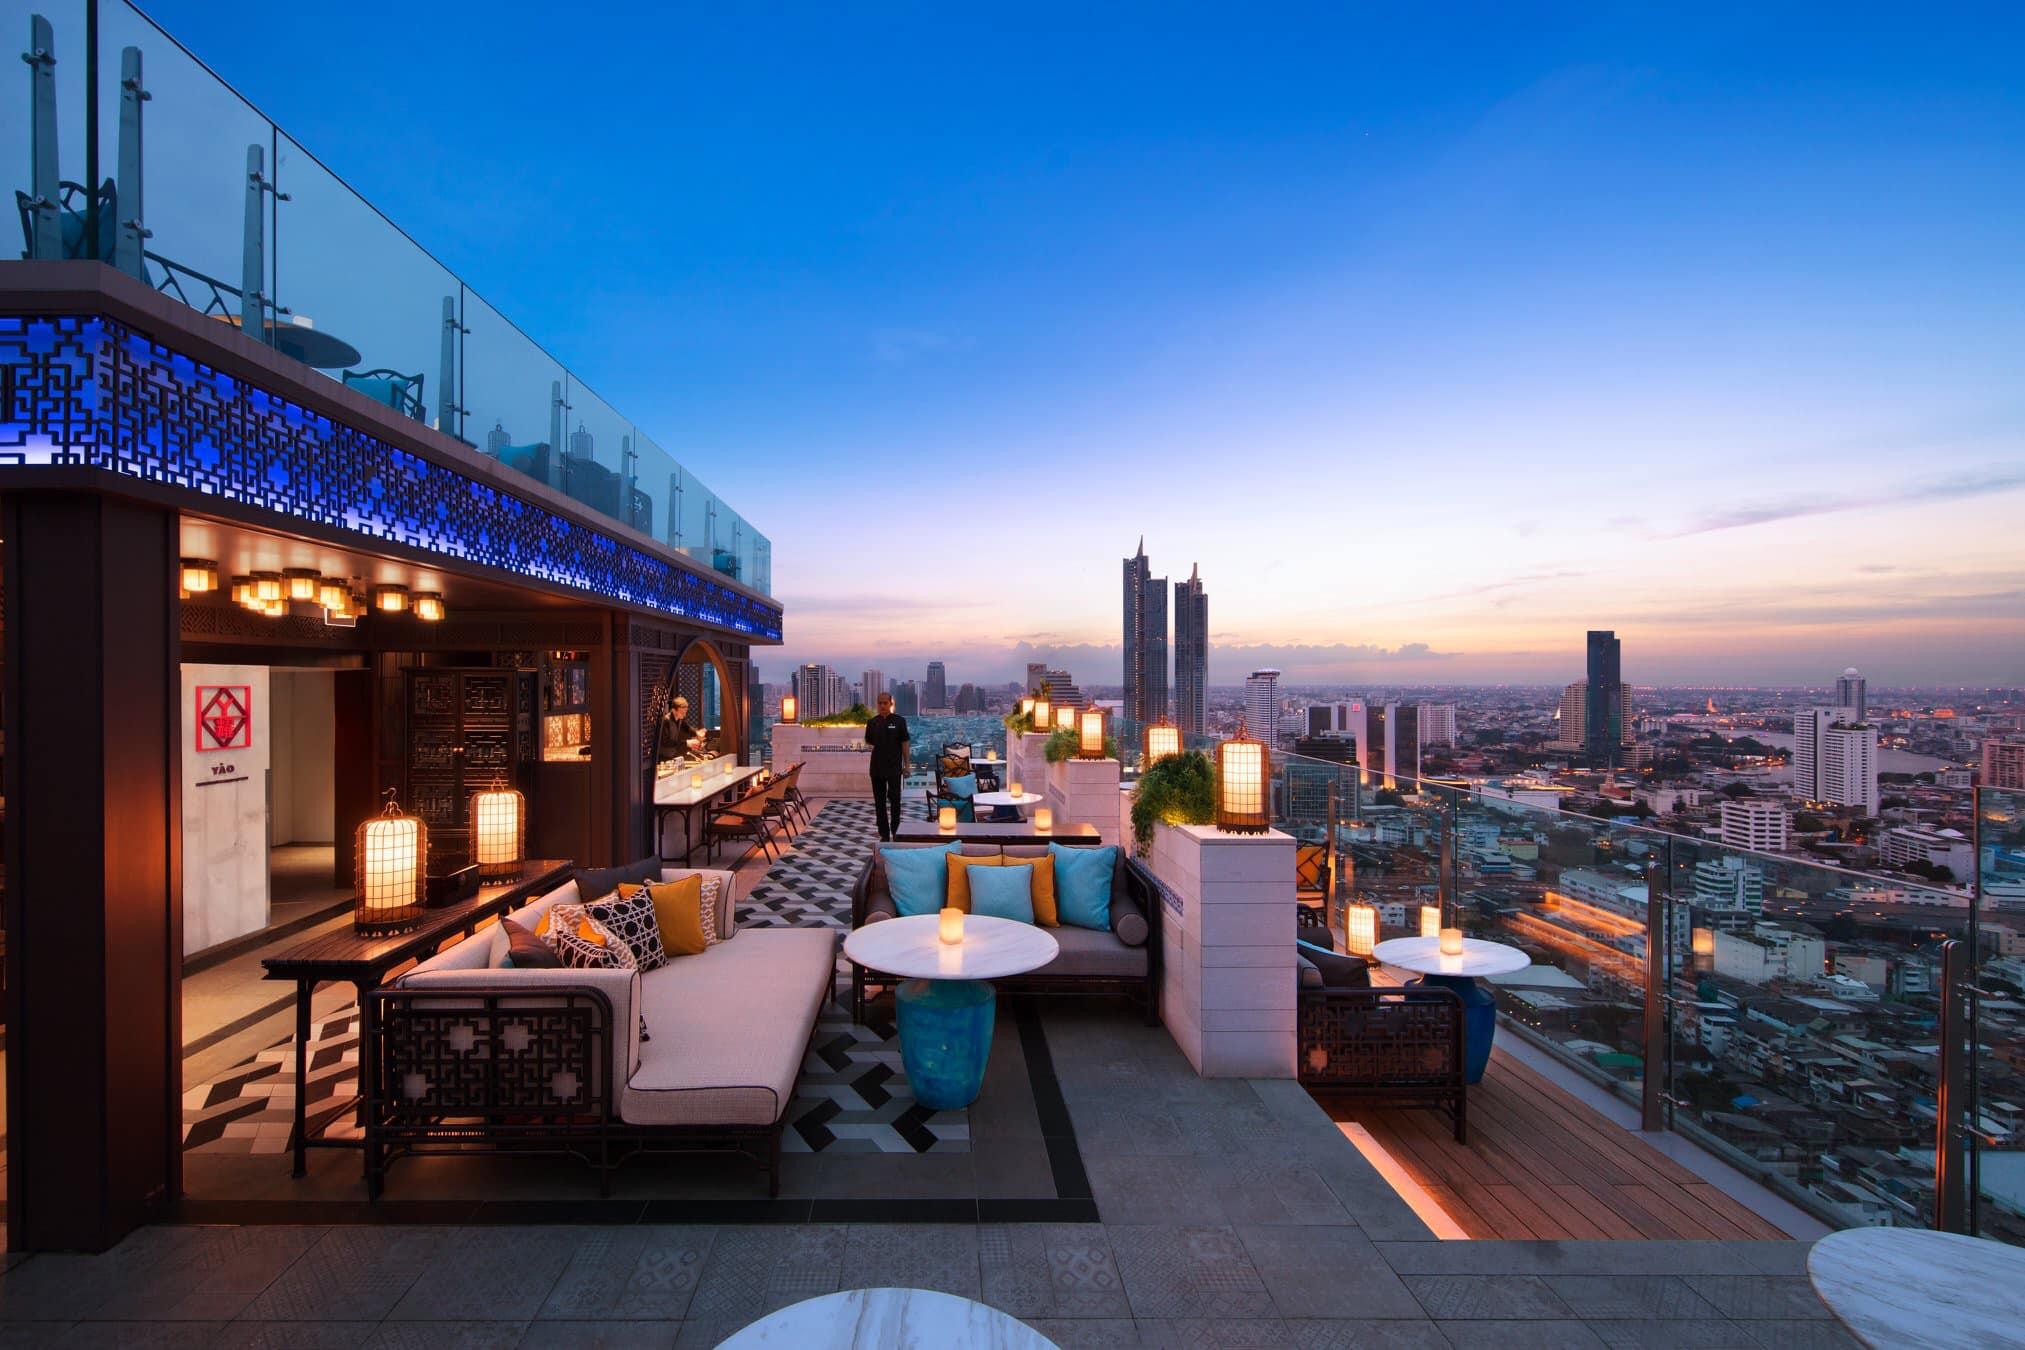 Best Rooftop Bar Bangkok, rooftop bar bangkok, sky bar bangkok, sky bar, bangkok bars, bangkok rooftop places, best rooftop bars in bangkok, top rooftop bars, bangkok best sky bars, sky bars, popular rooftop bars, new rooftop bars bangkok, best speakeasies bangkok, Yao Rooftop Bar, Yao Restaurant,